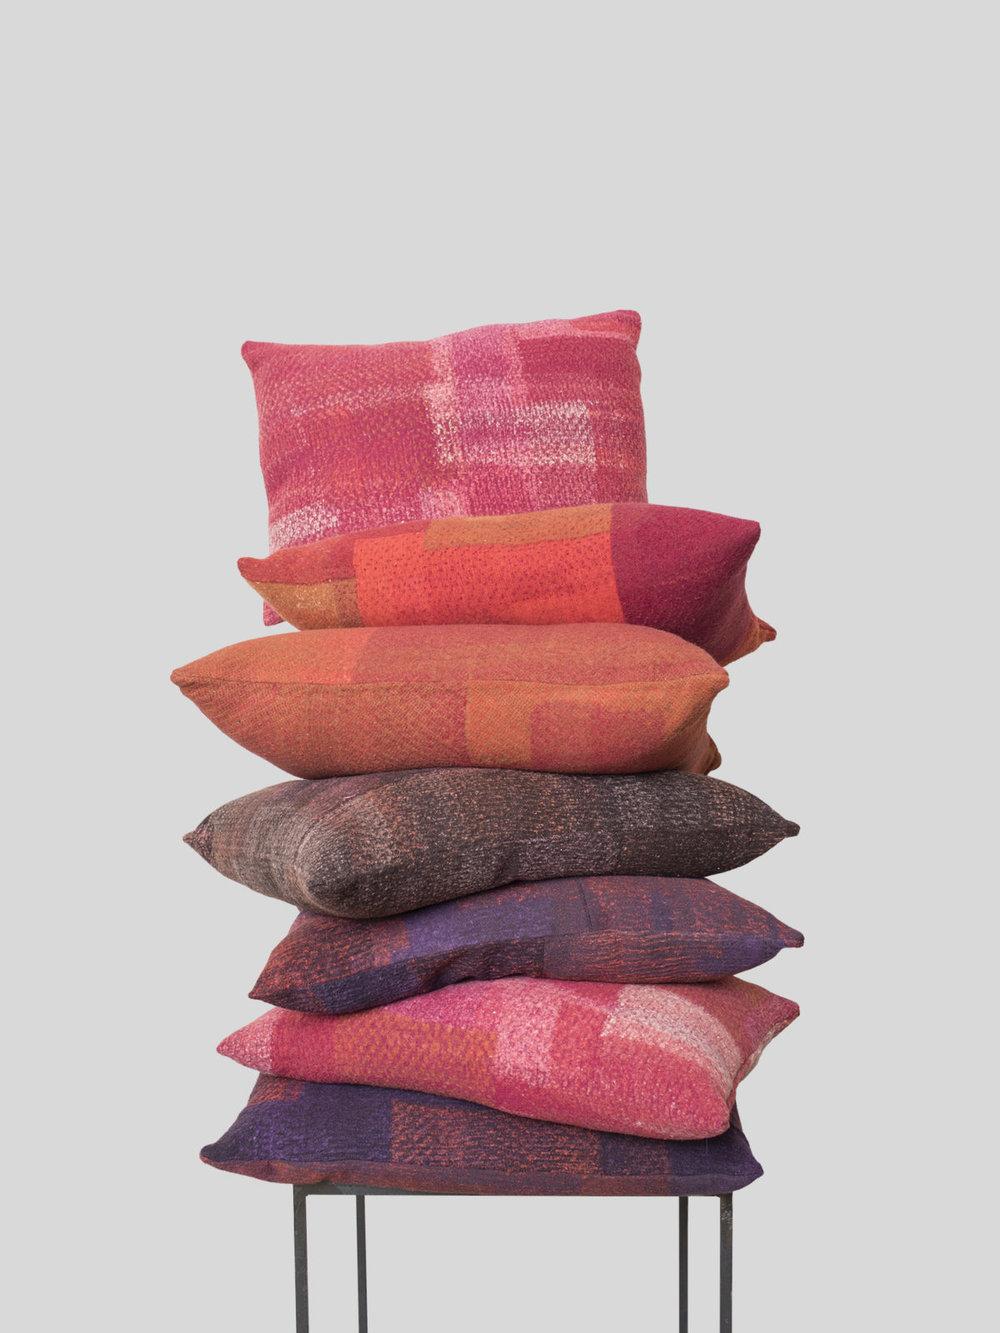 pillows-_-carolina-bedoya-and-sigi-ahl-_-wool-linen-1200x1600.jpg